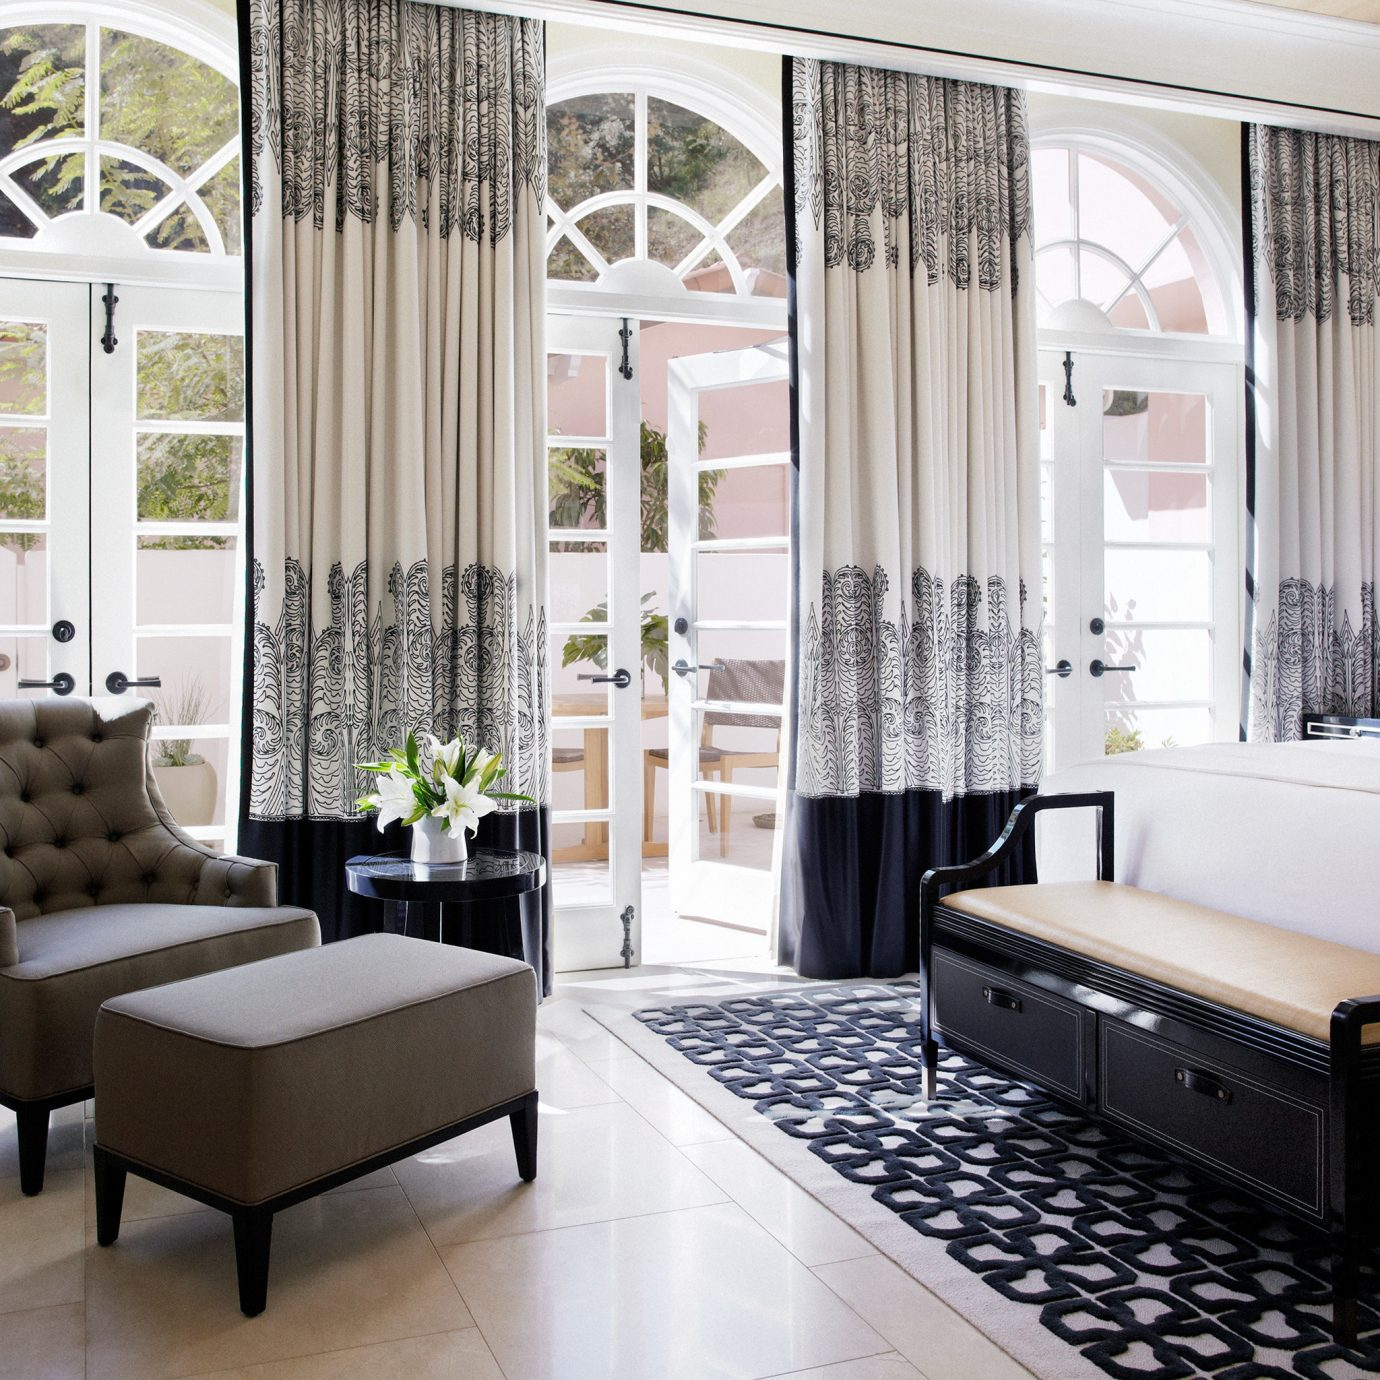 Bedroom Hotels Luxury Modern property living room home Suite condominium curtain